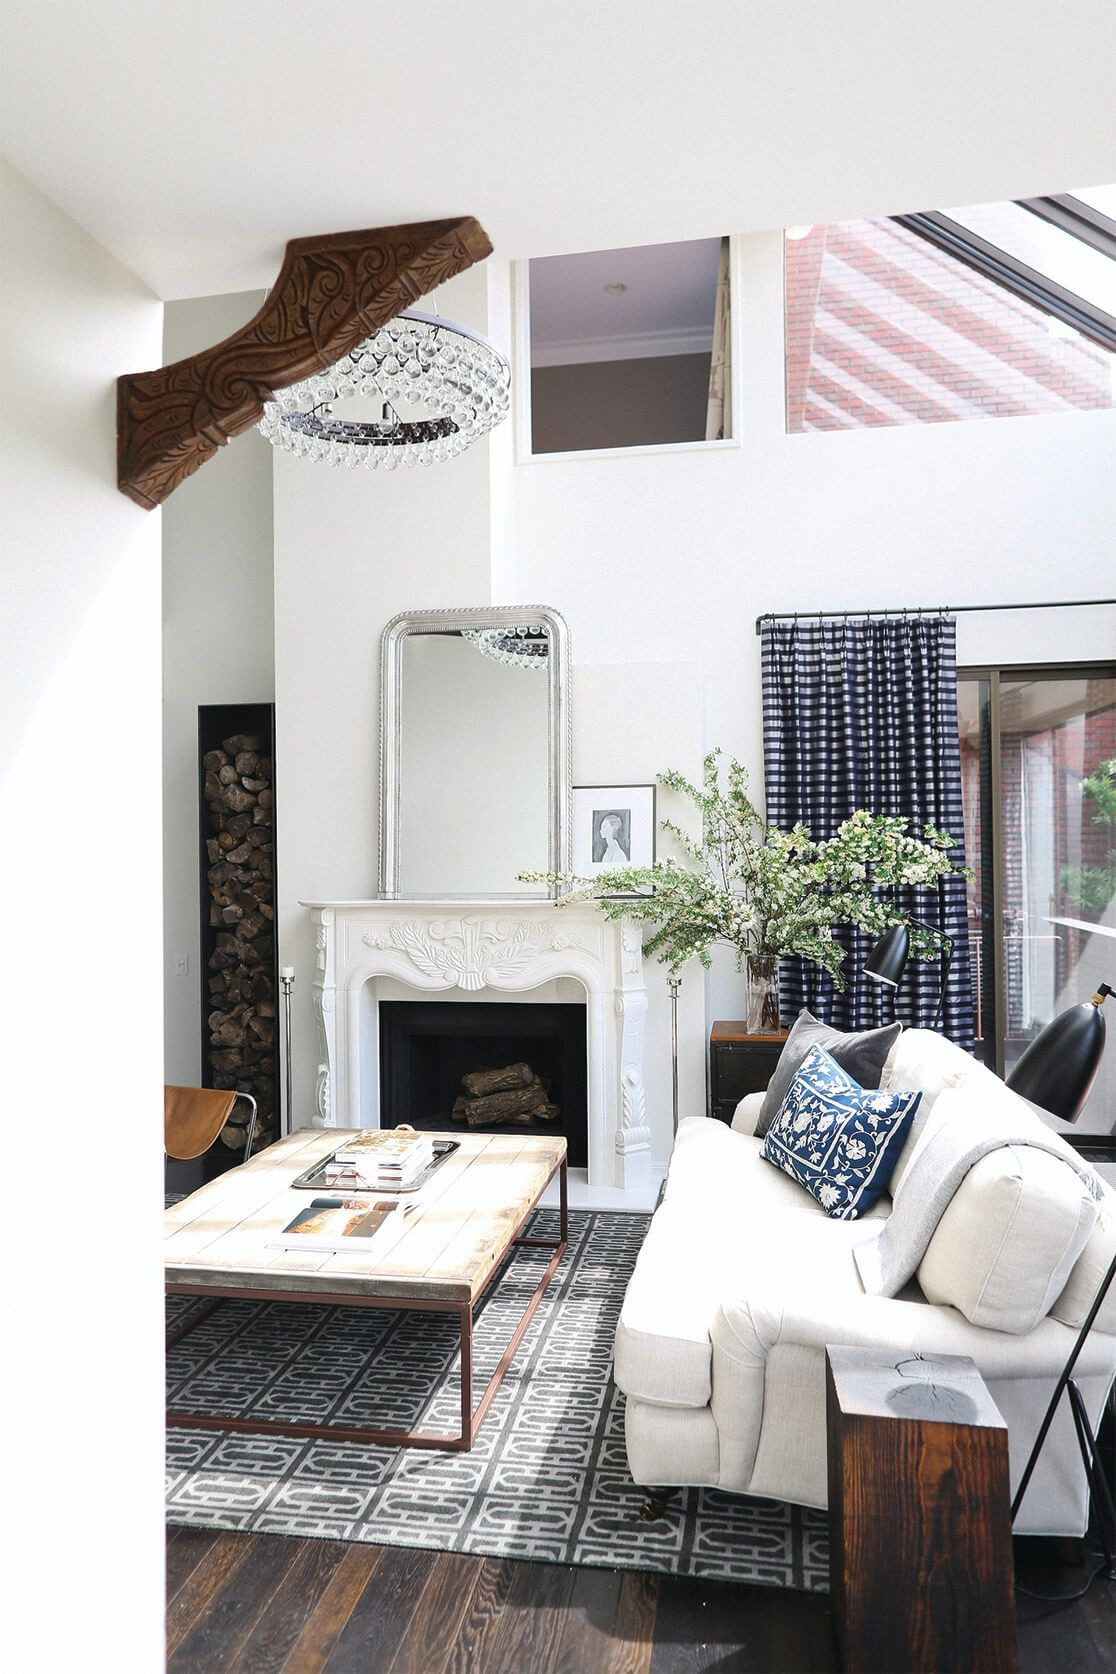 45 Best Fireplace Ideas - Stylish Indoor Fireplace Designs, Decor ...